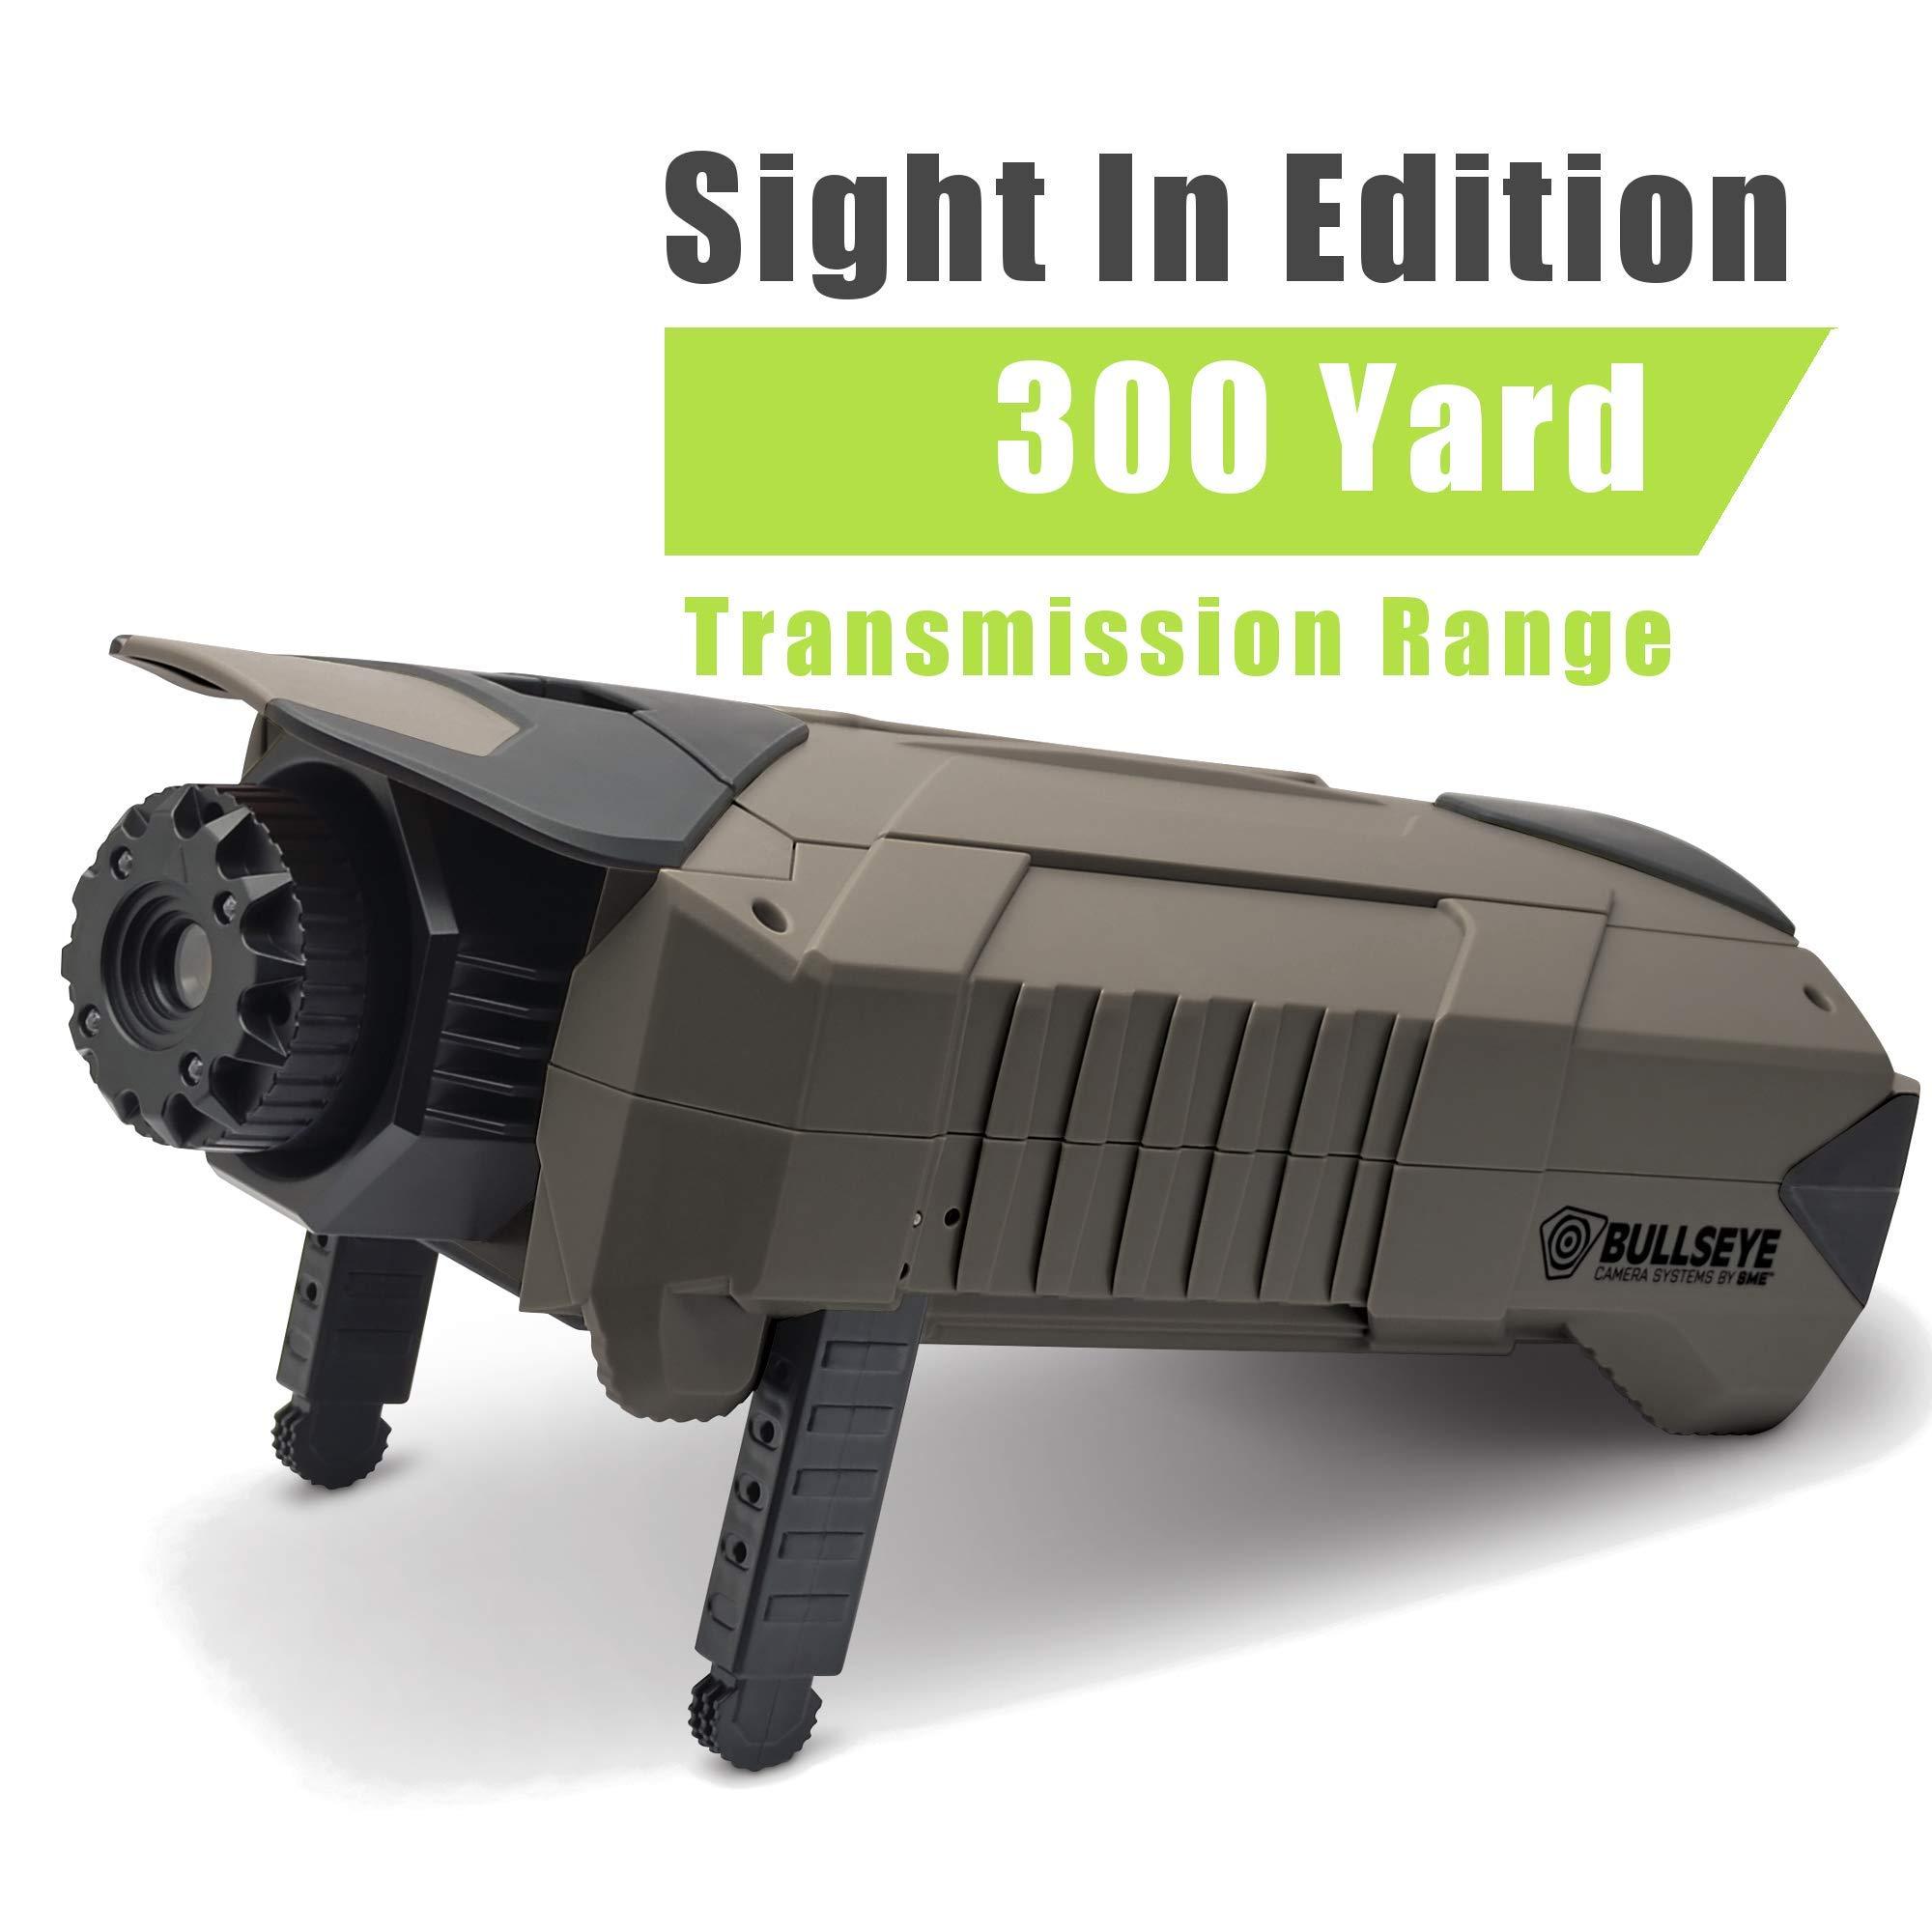 SME Bullseye Sight in Range Camera - 300 Yard Range by SME